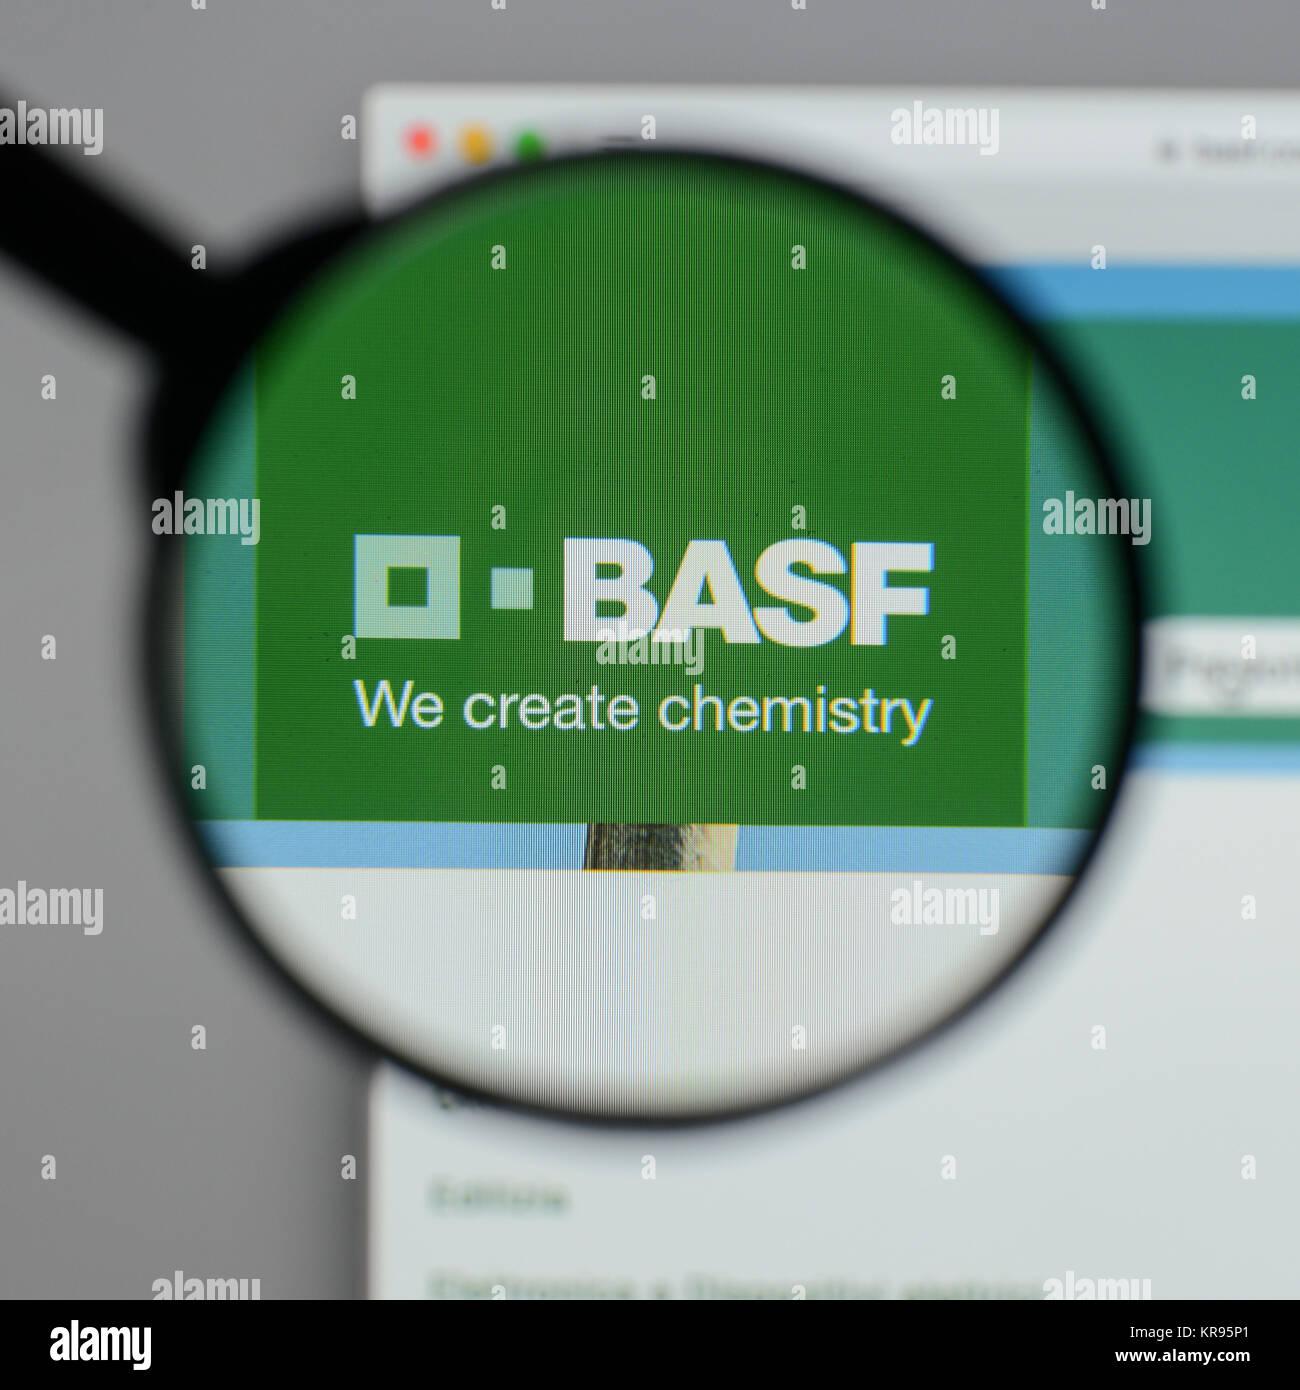 Basf Stock Photos & Basf Stock Images - Alamy